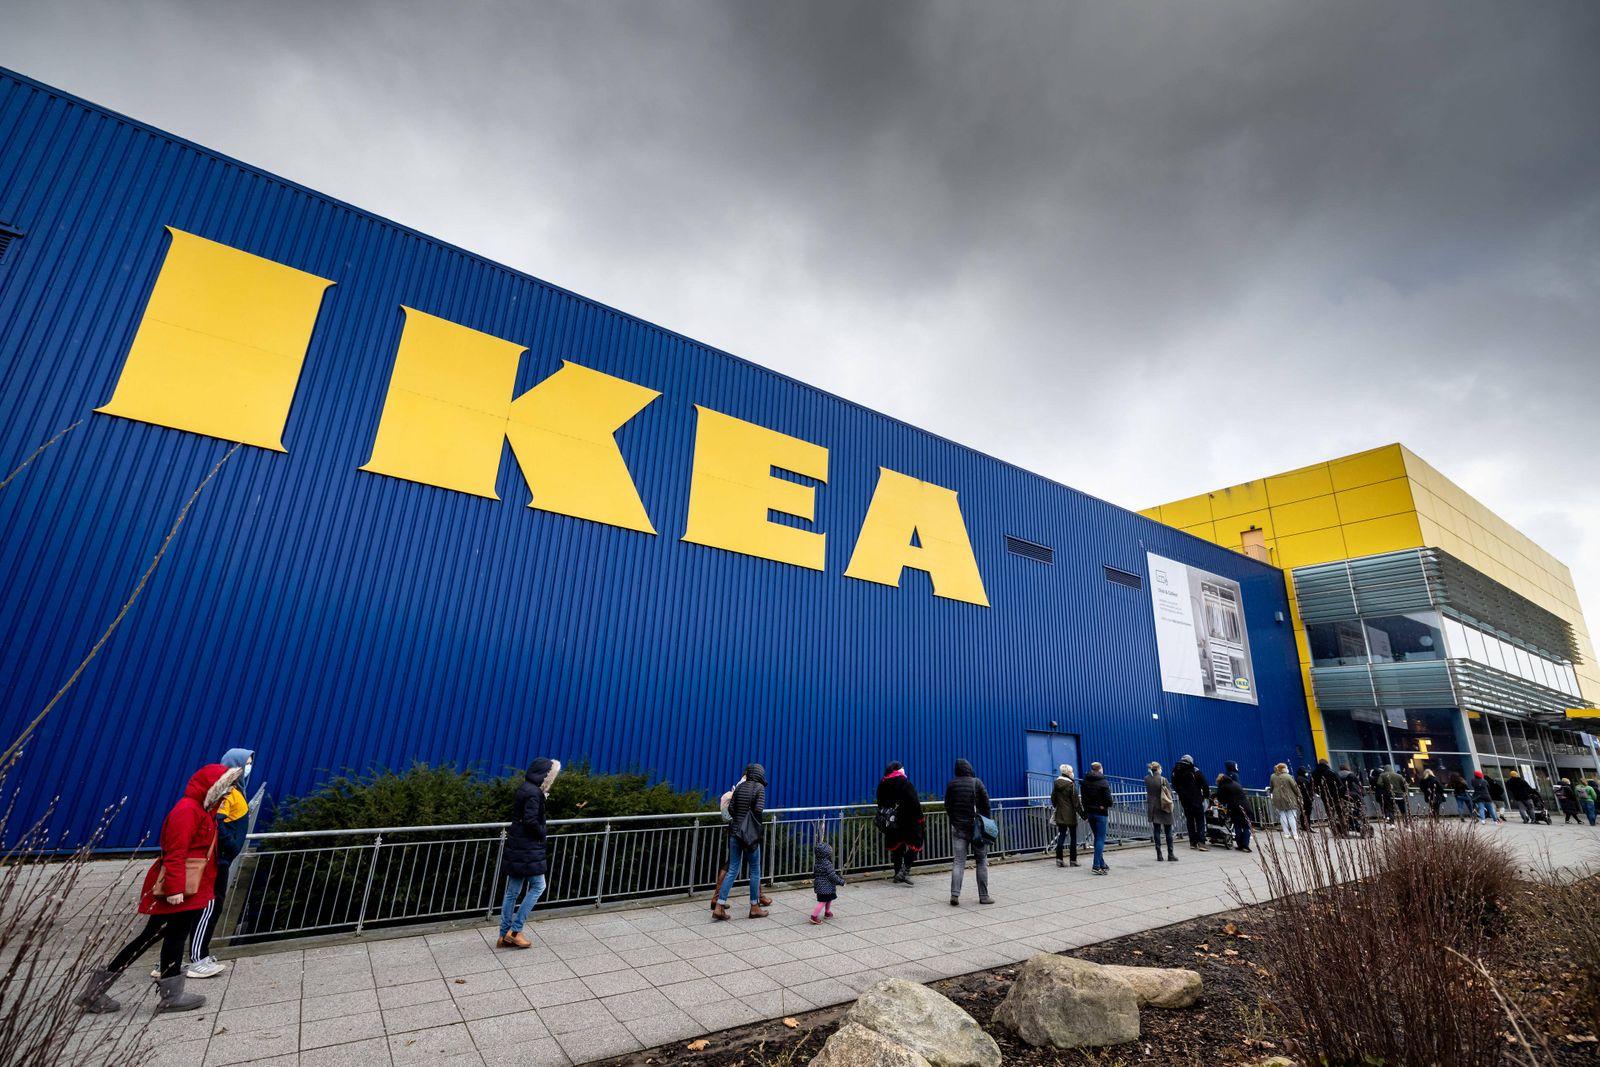 Kiel, 12. M?rz 2021 - Lange Warteschlange am Eingang des IKEA Einrichtungshaus in Kiel *** Kiel, 12 March 2021 Long queu